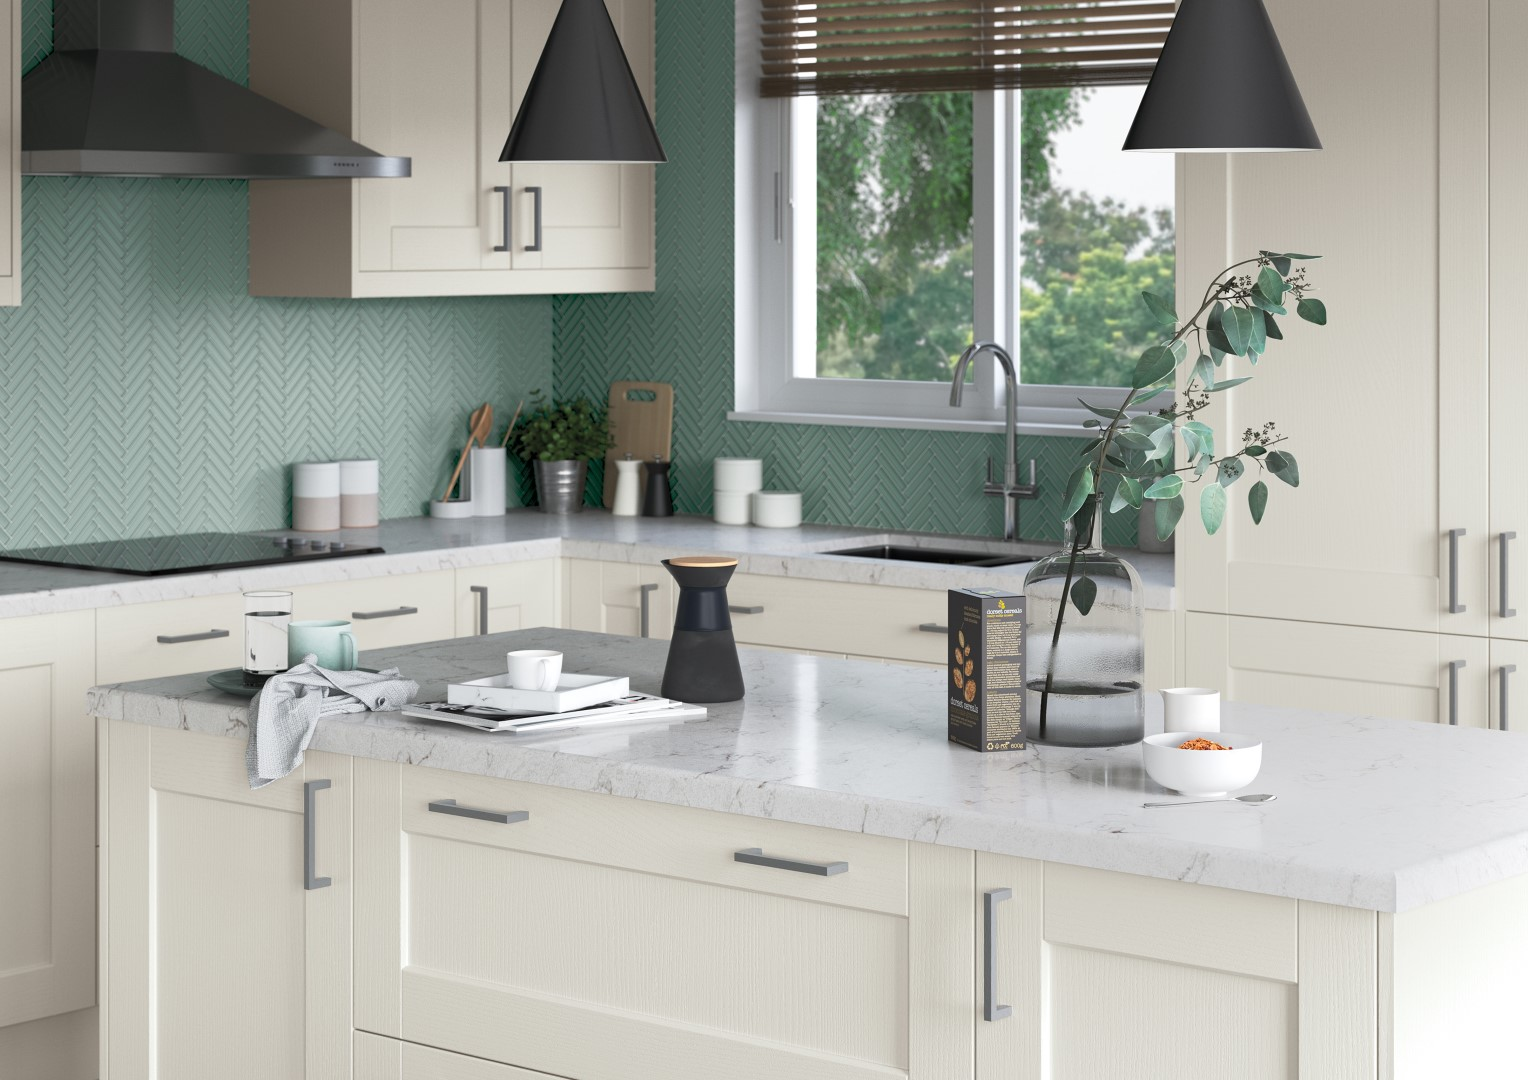 Kensington Porcelain - Kitchen Design - Alan Kelly Kitchens - Waterford - 3